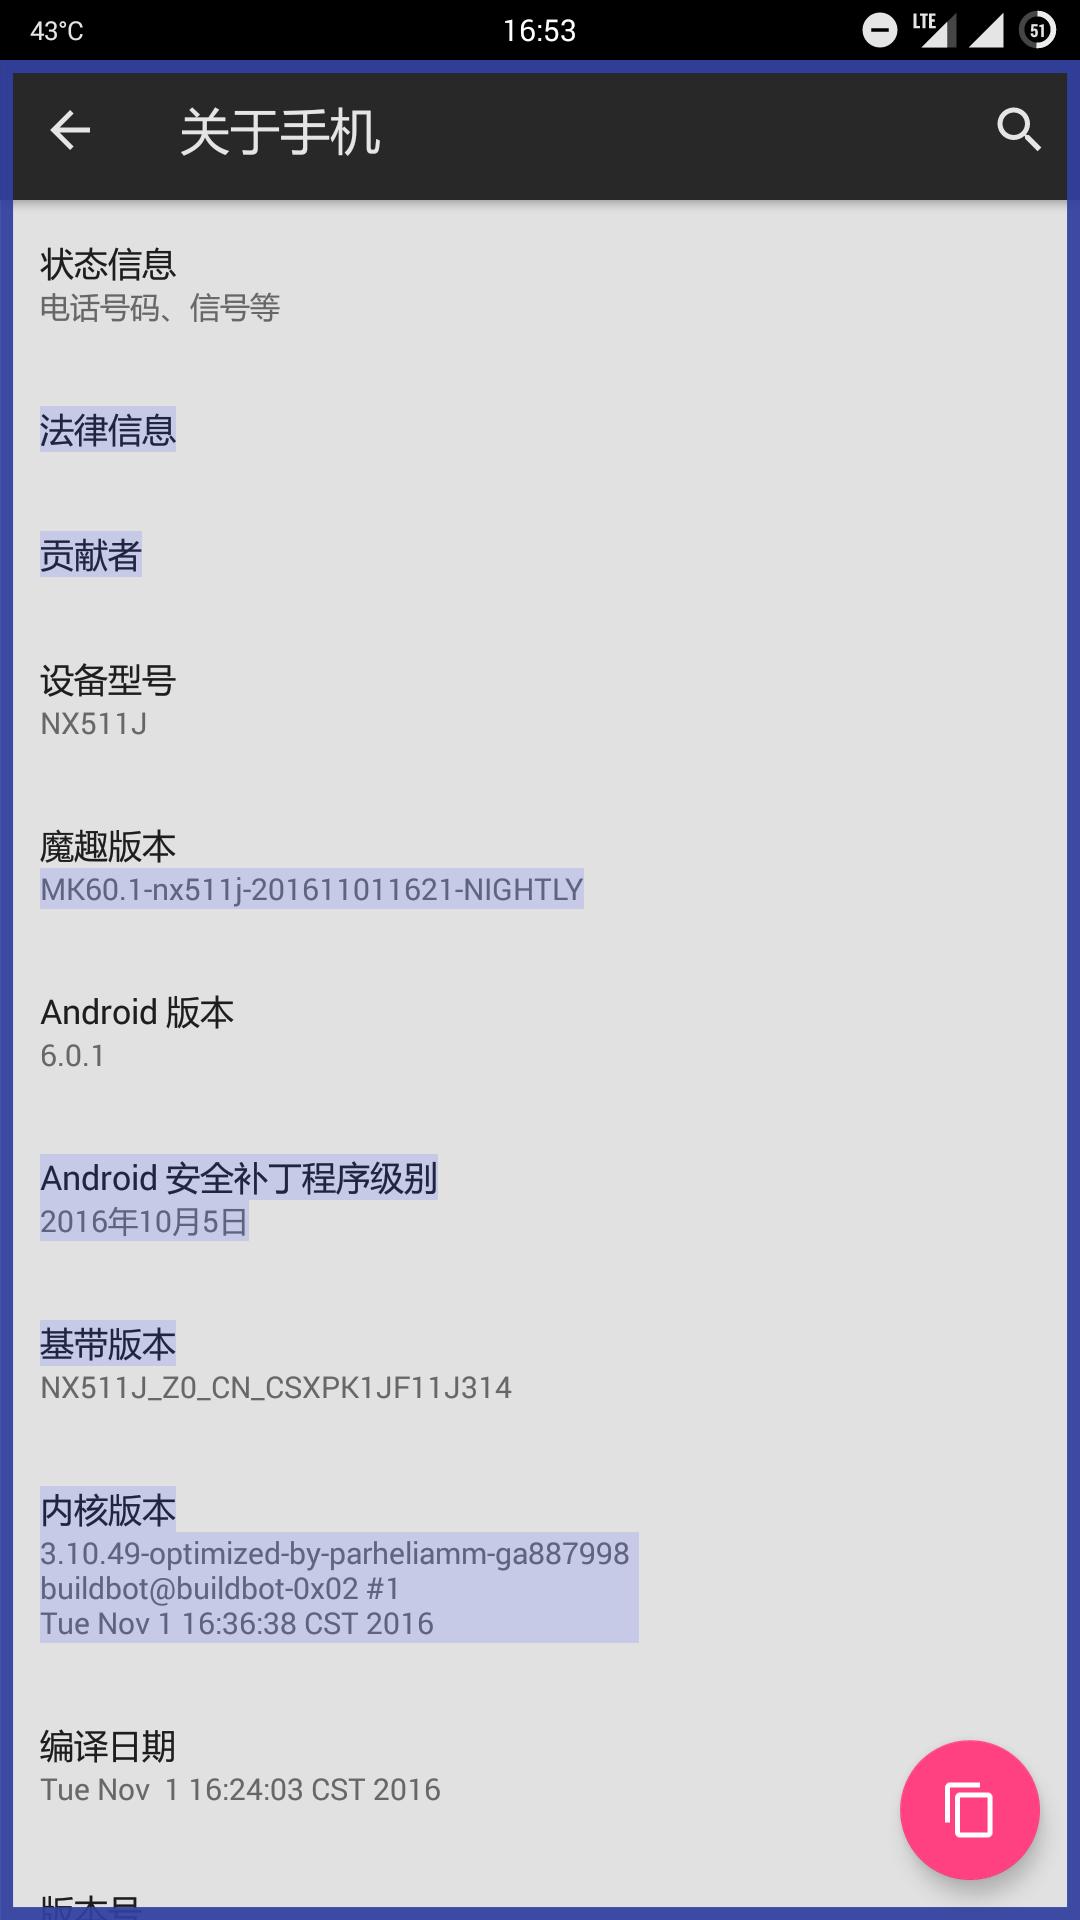 Screenshot_20161118-165315.png